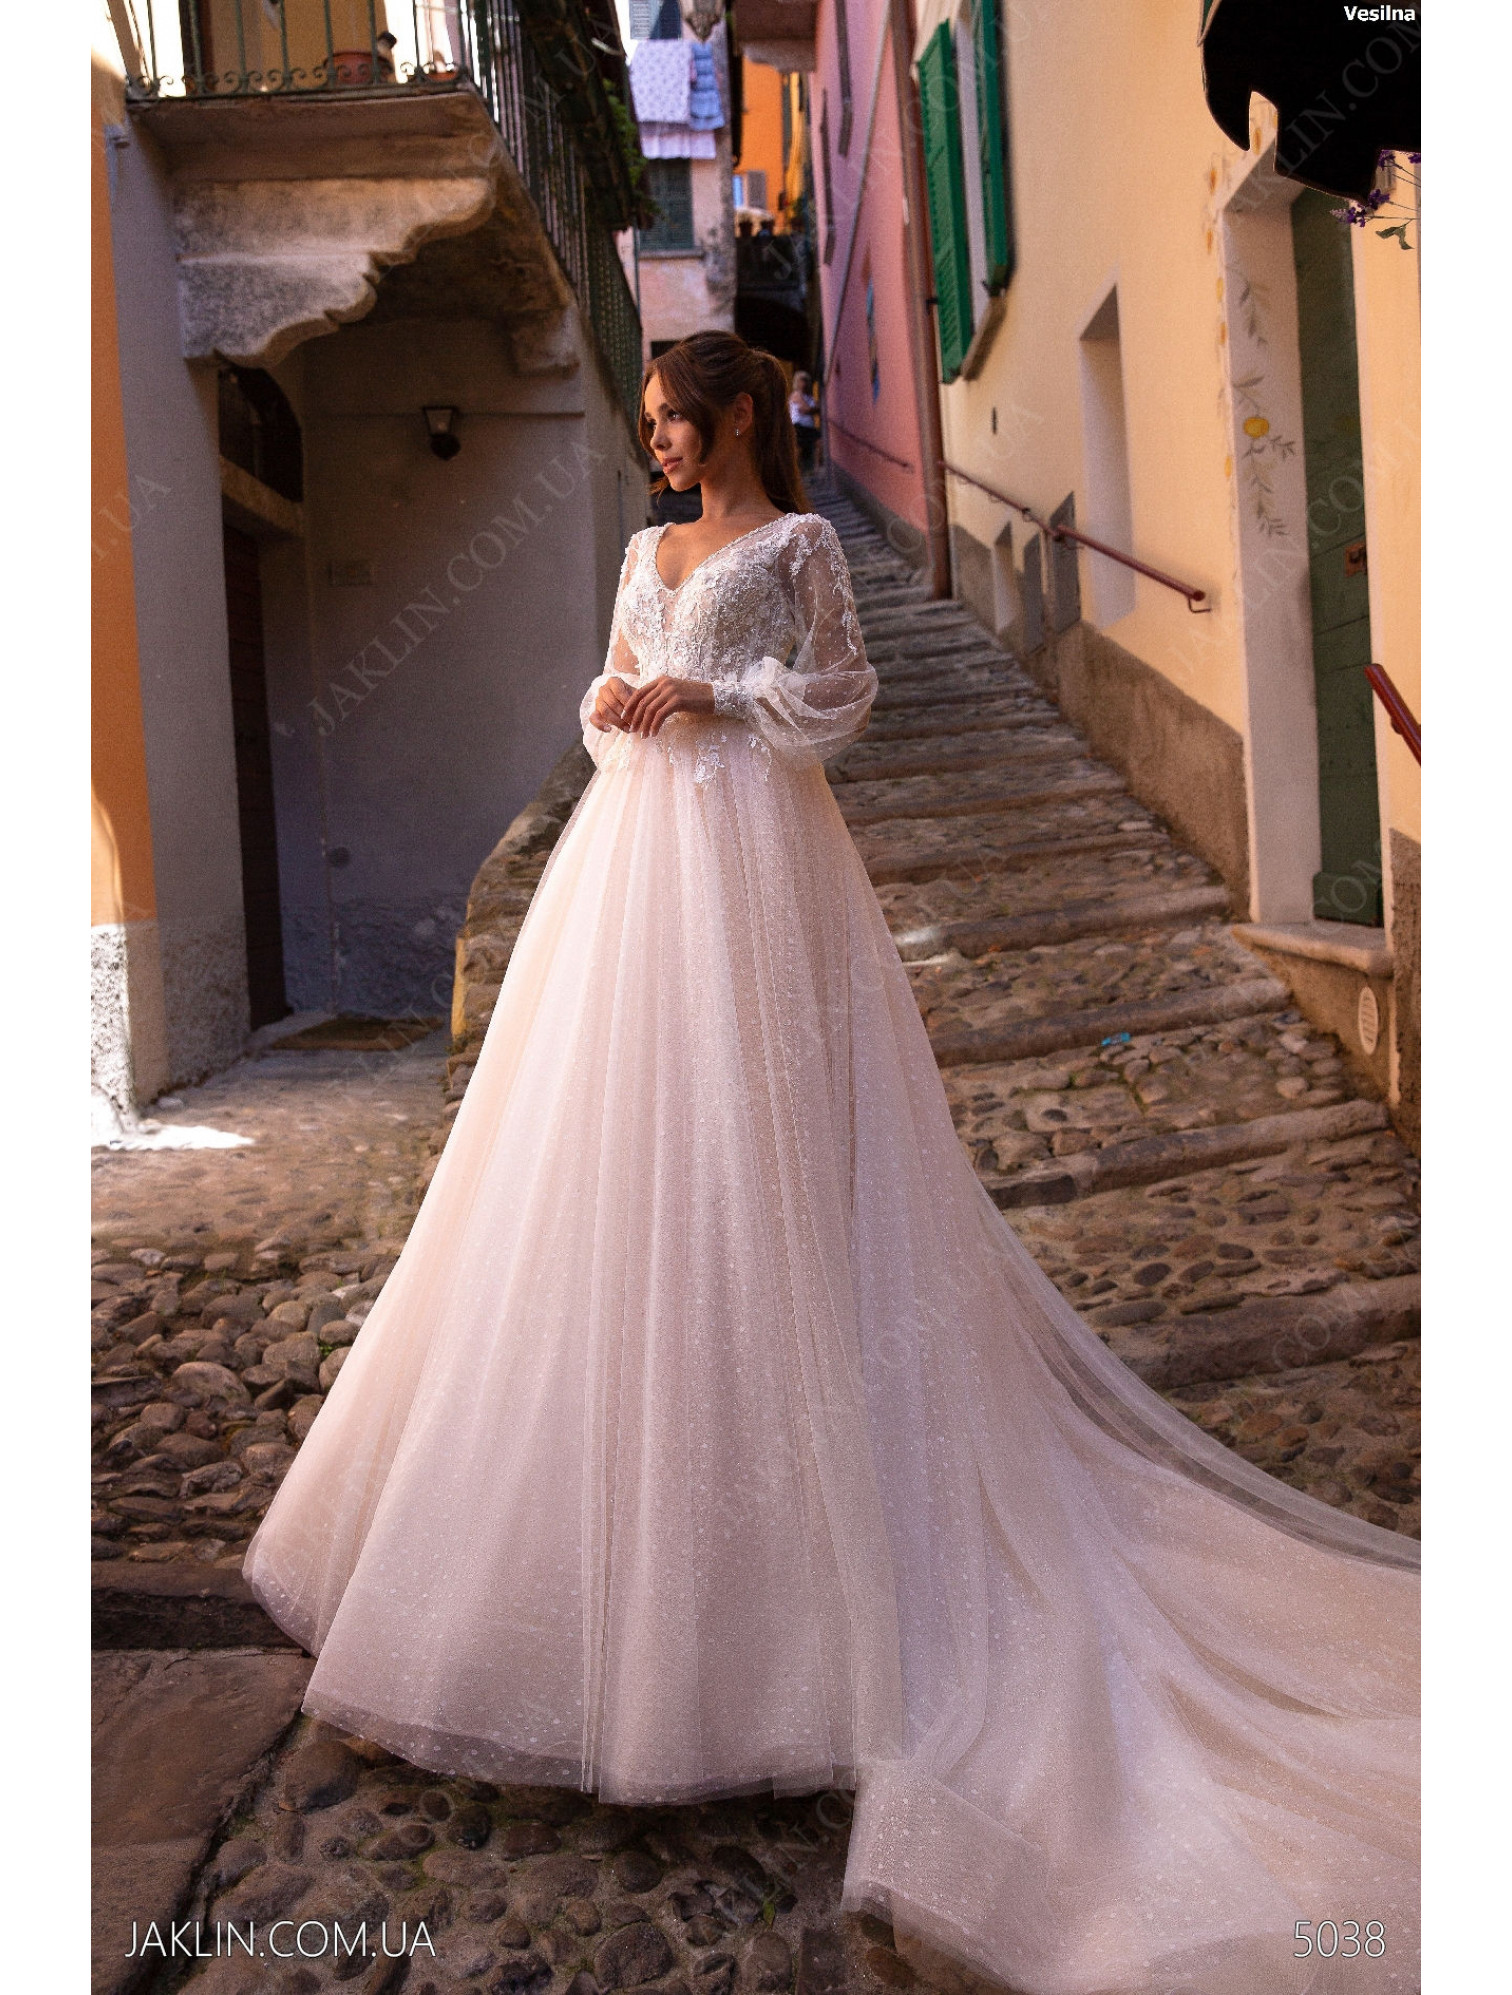 Wedding dress 5038